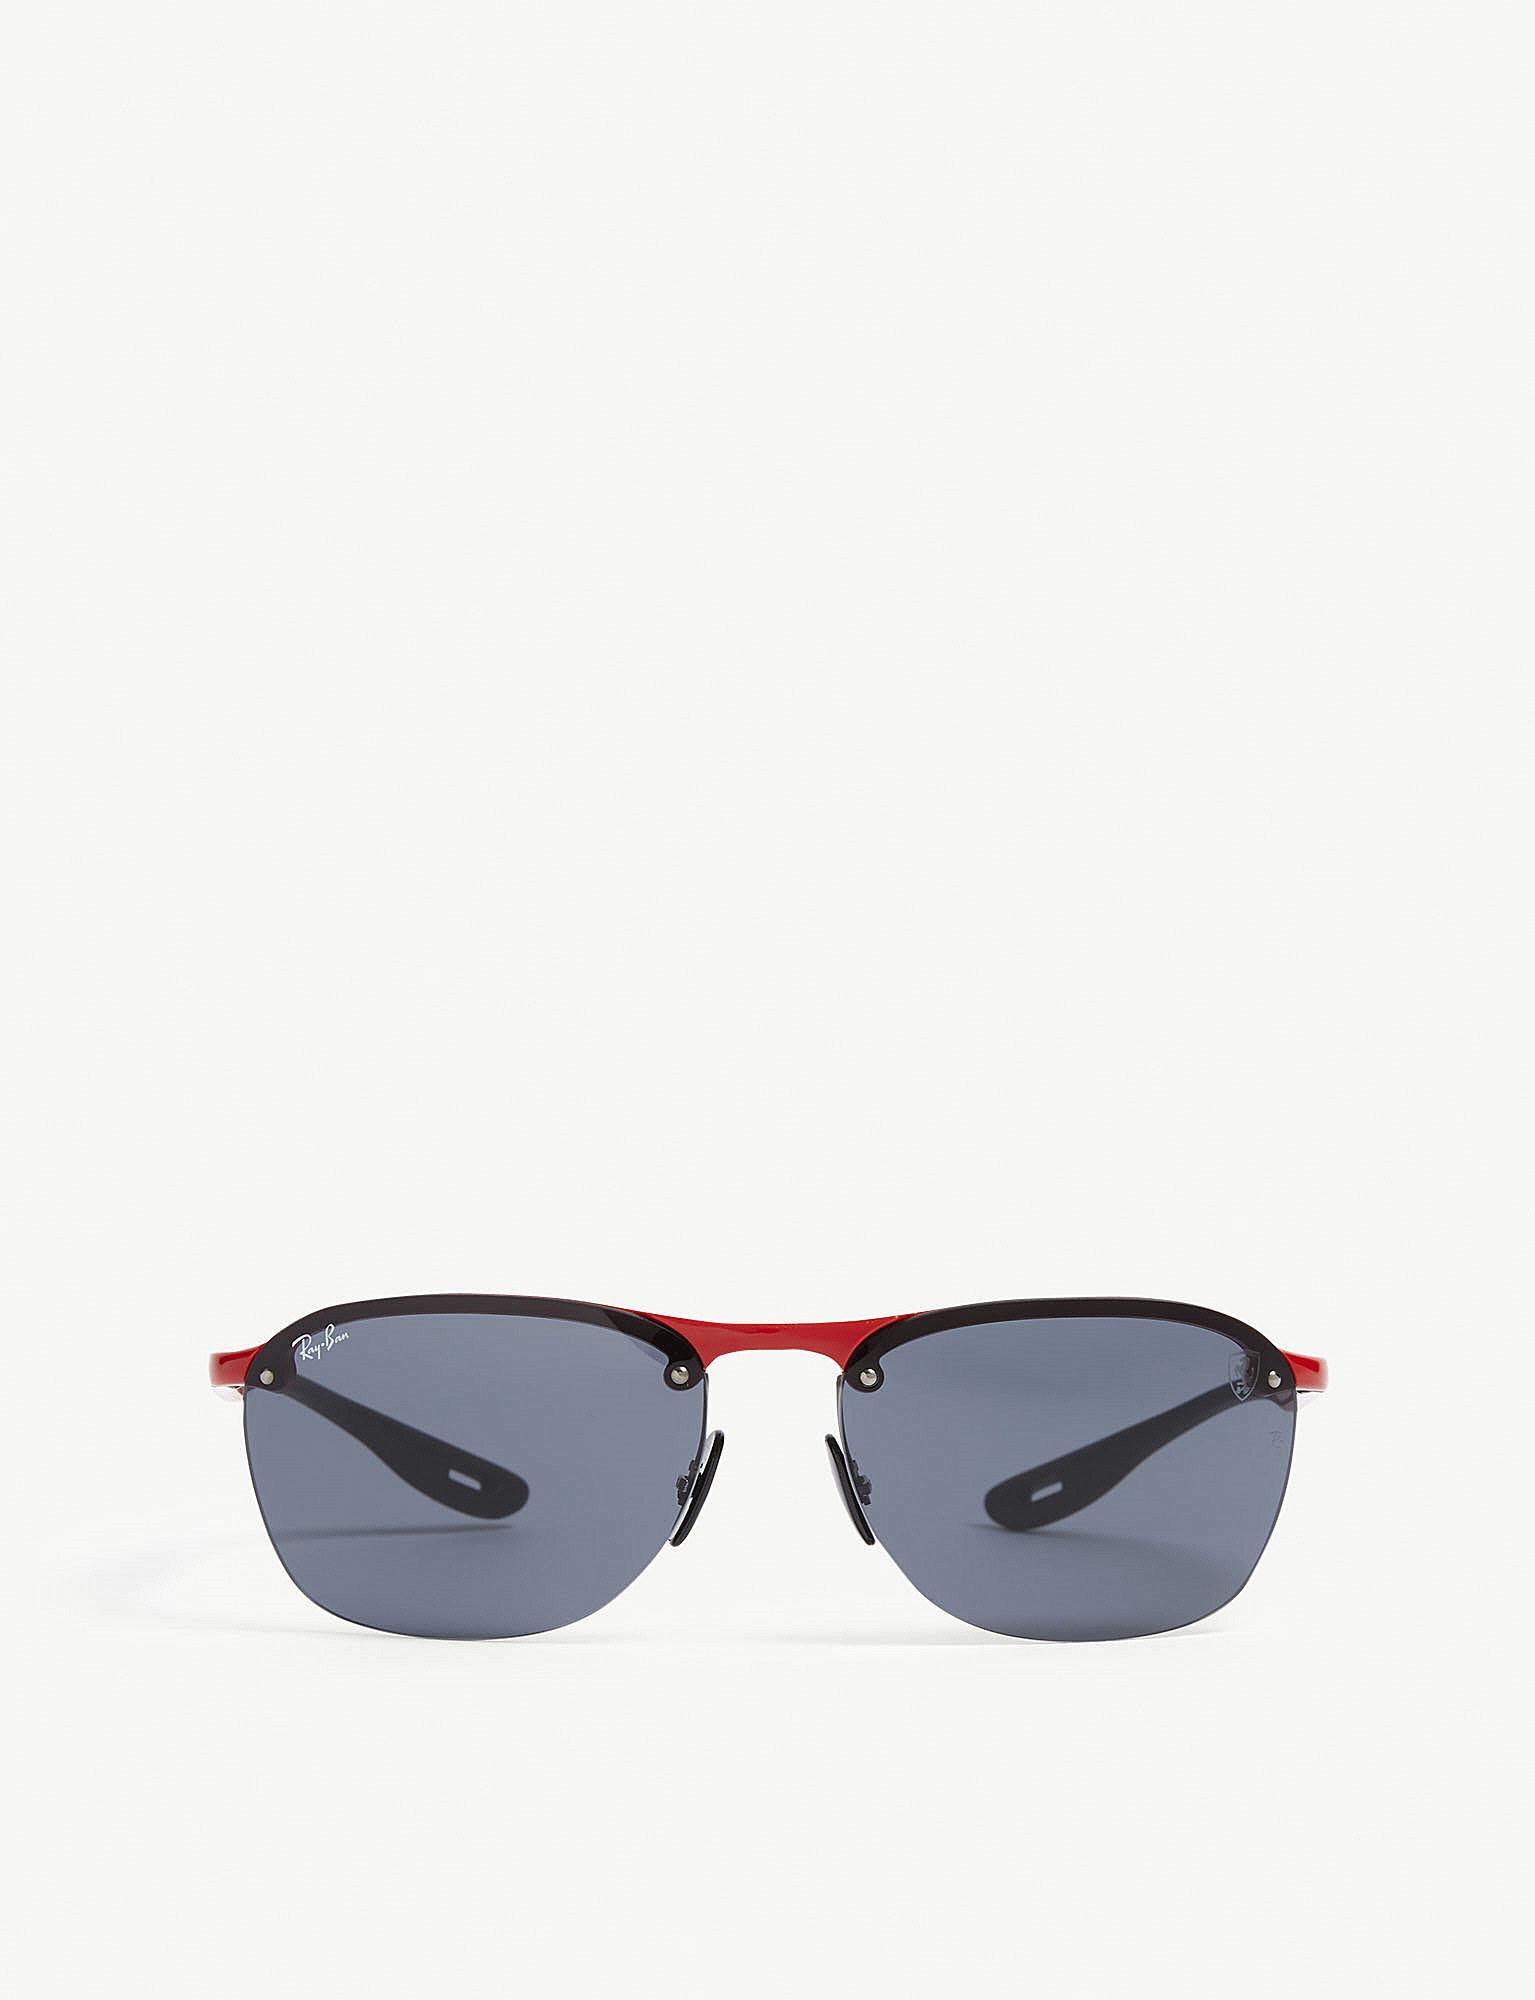 0a97451e191cfc Lyst - Ray-Ban Rb4302 Scuderia Ferrari Rectangle-frame Sunglasses in Red